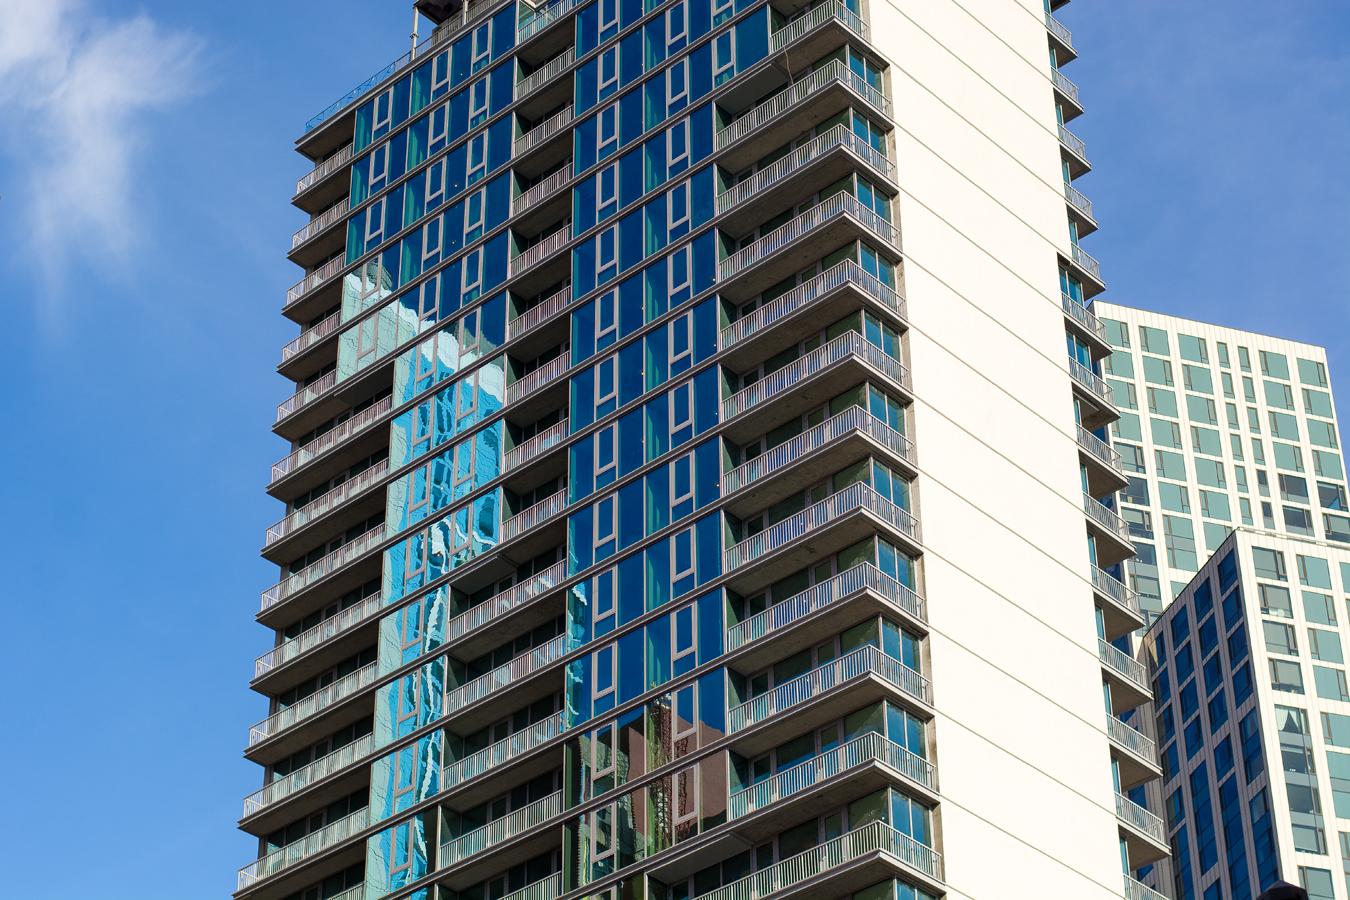 The Azure, 436 Albee Square